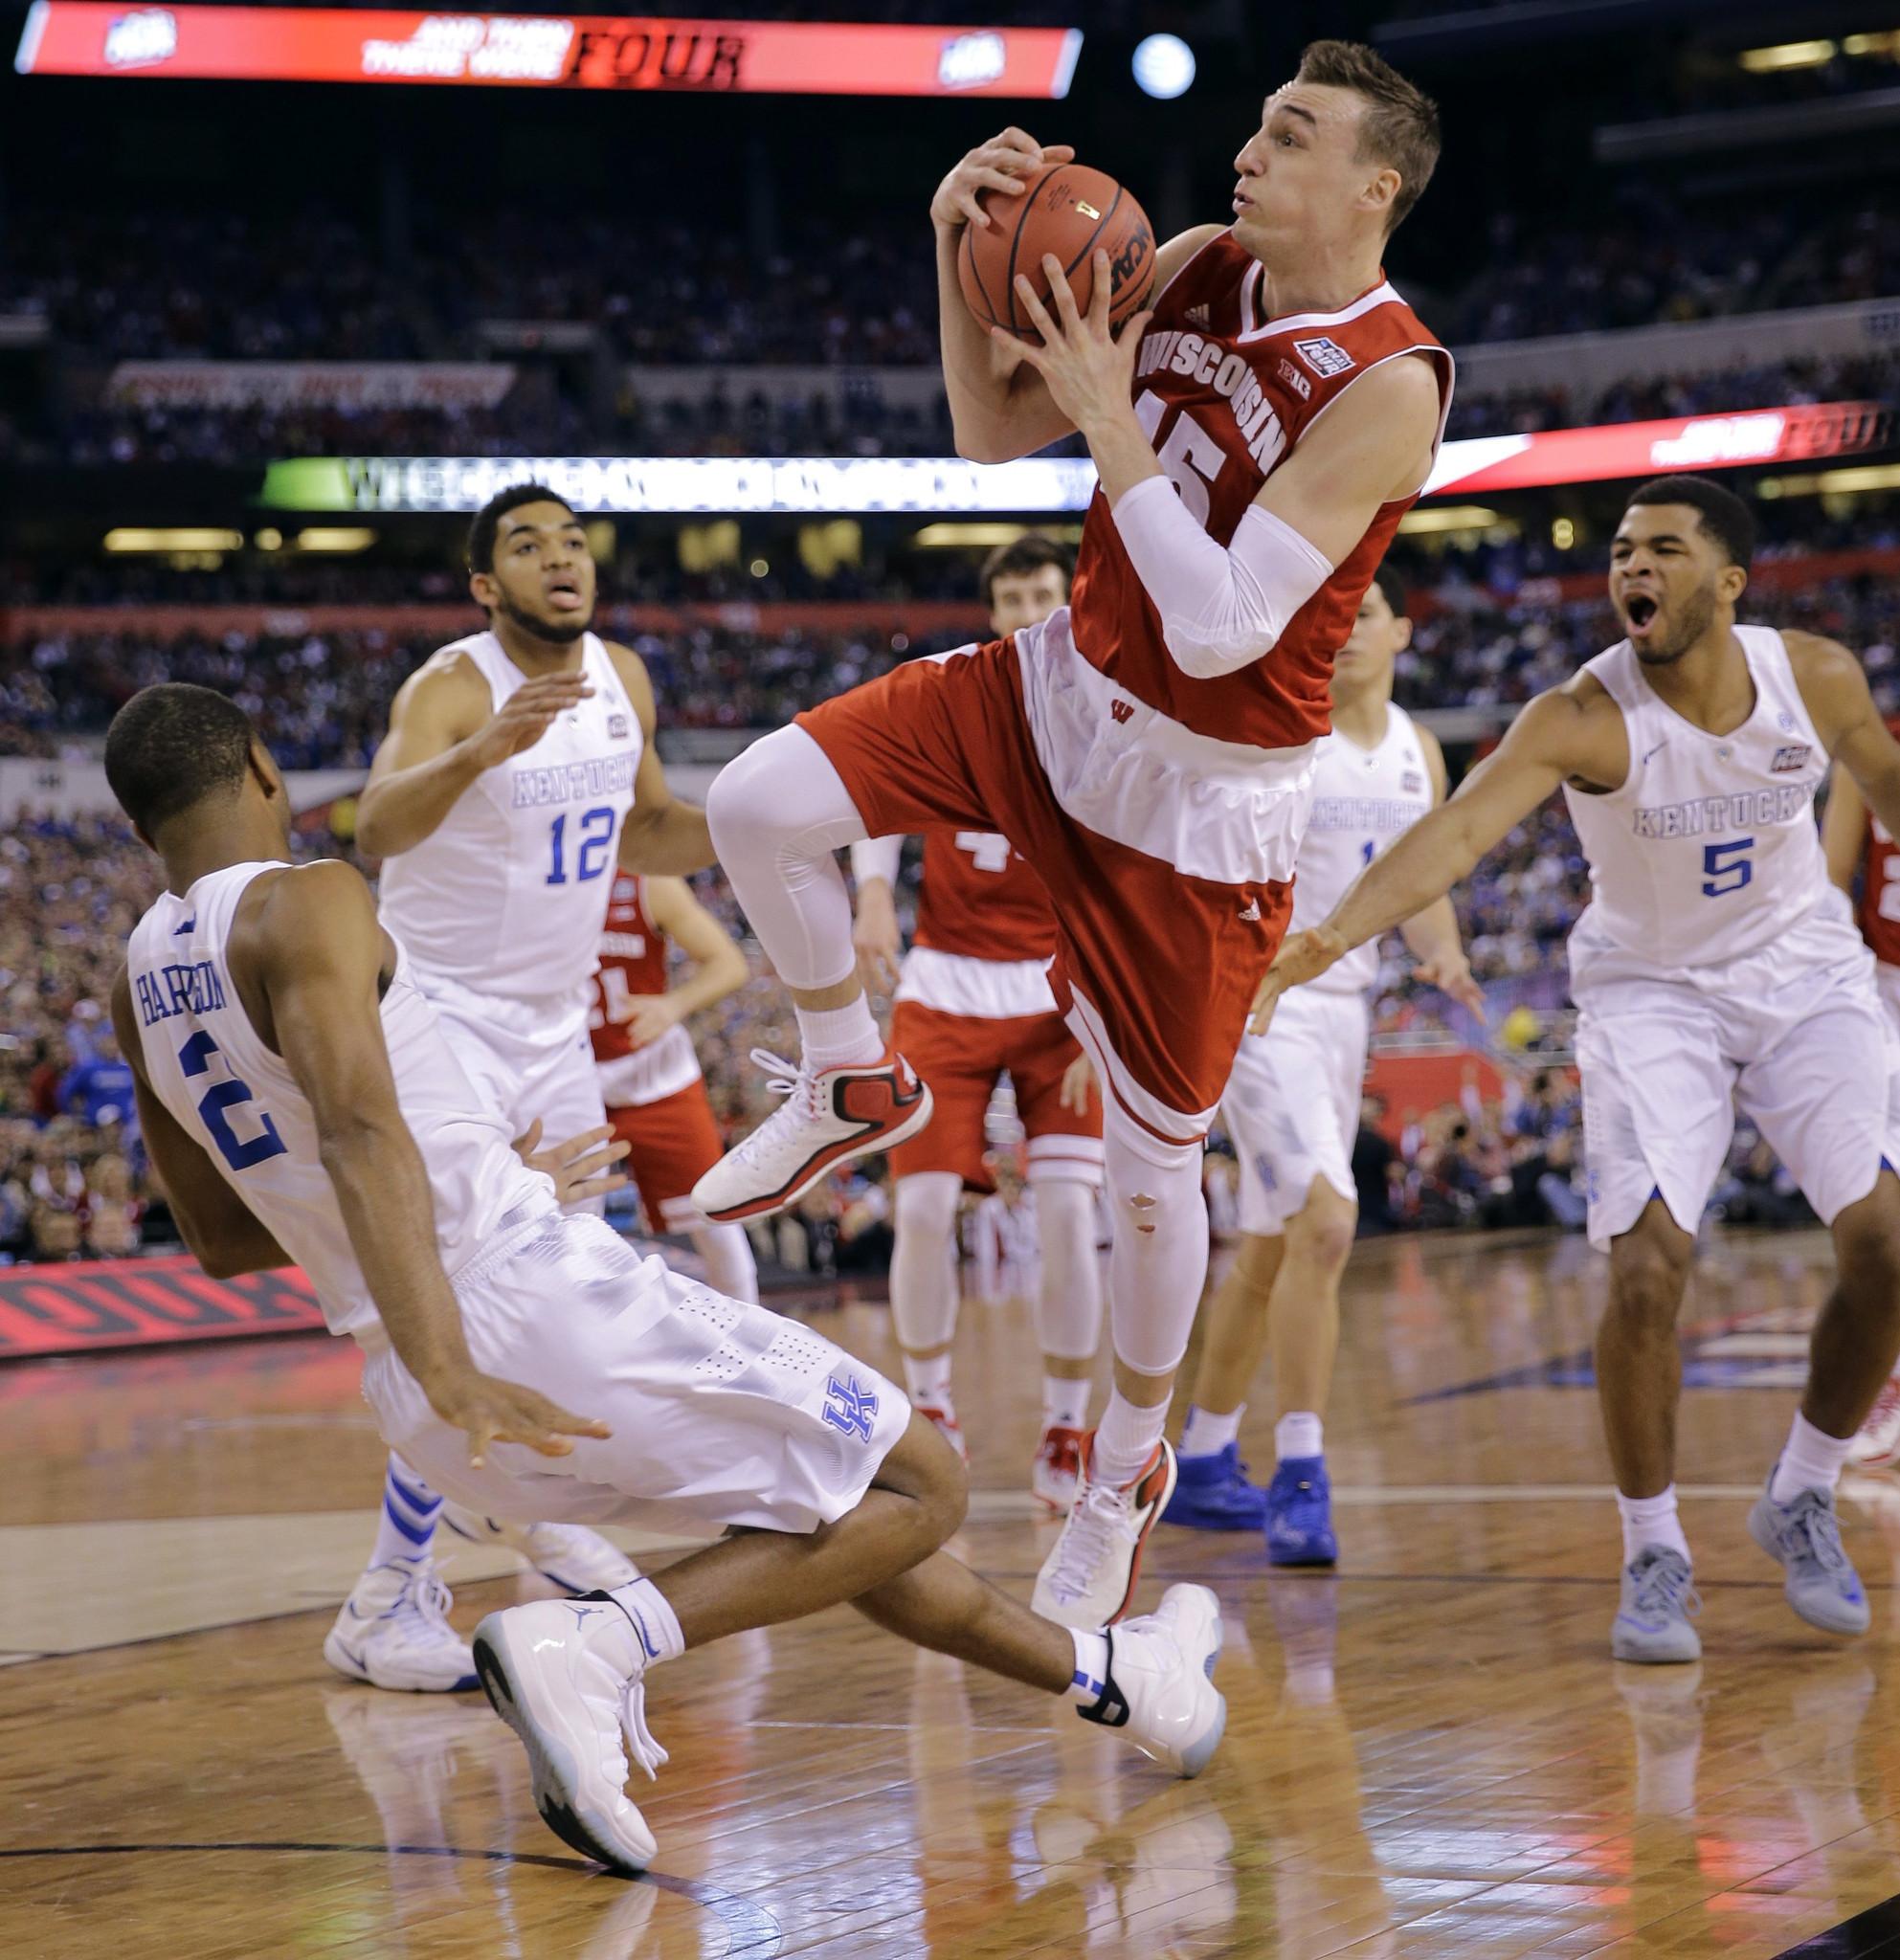 NCAA tournament: Duke, Michigan State, Gonzaga, Louisville advance to Elite 8